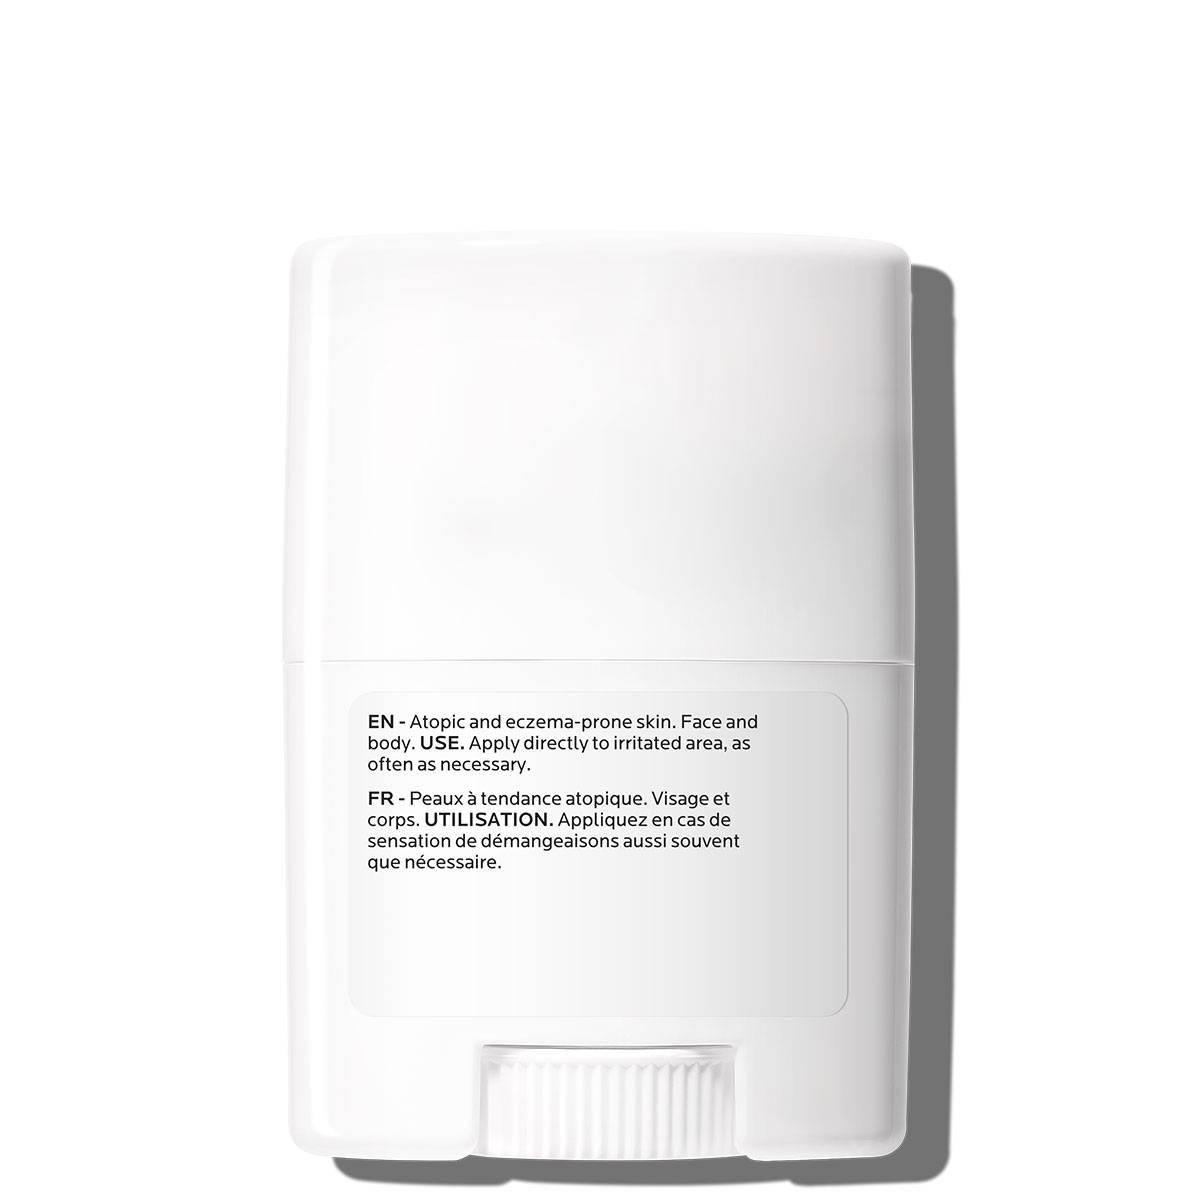 La Roche Posay Produktsida Tendens till atopi Lipikar Stick AP 15ml 3337875566254